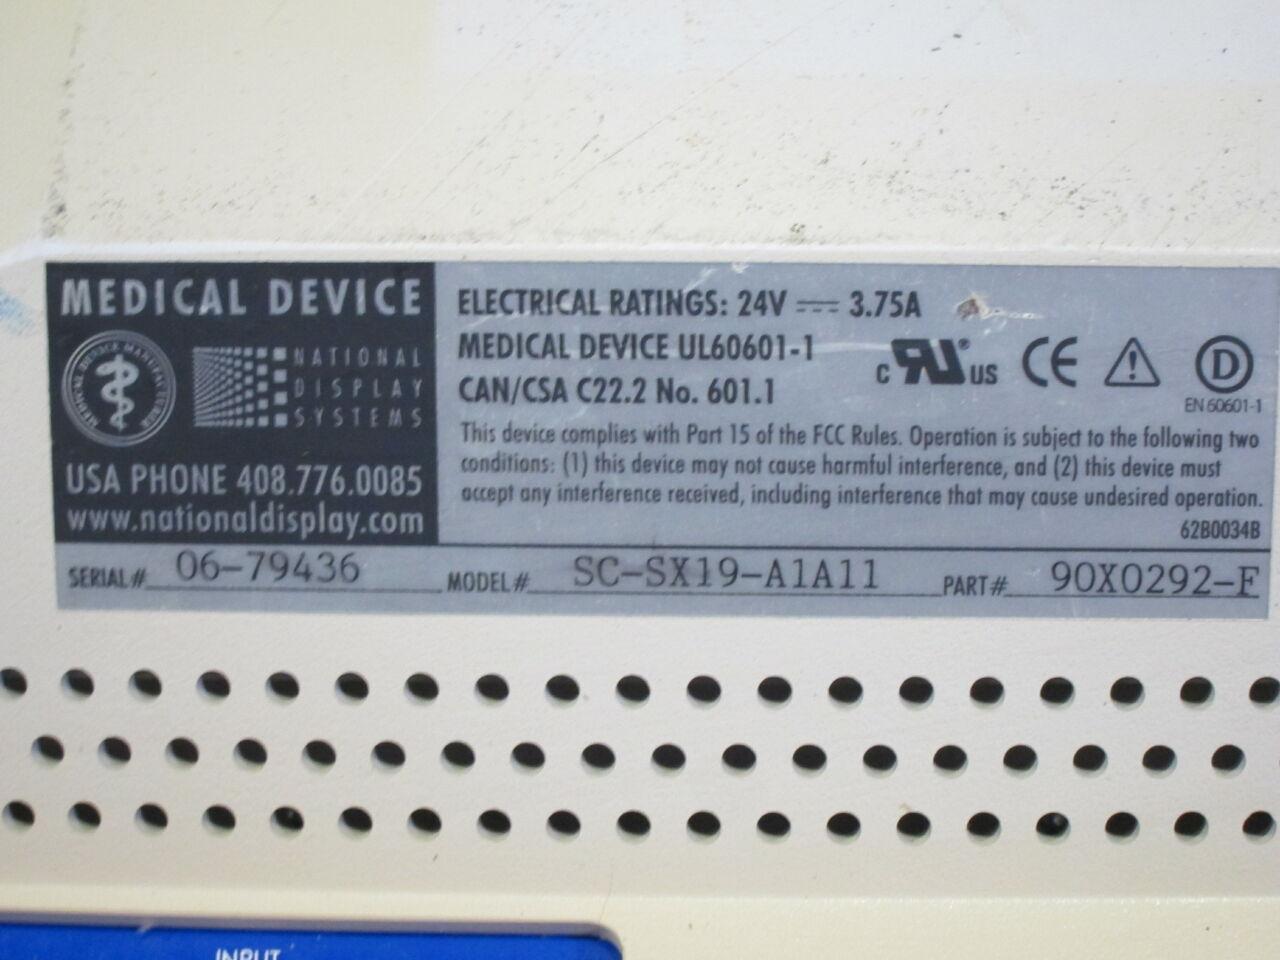 KARL STORZ SC-SX19-A1A11 Display Monitor